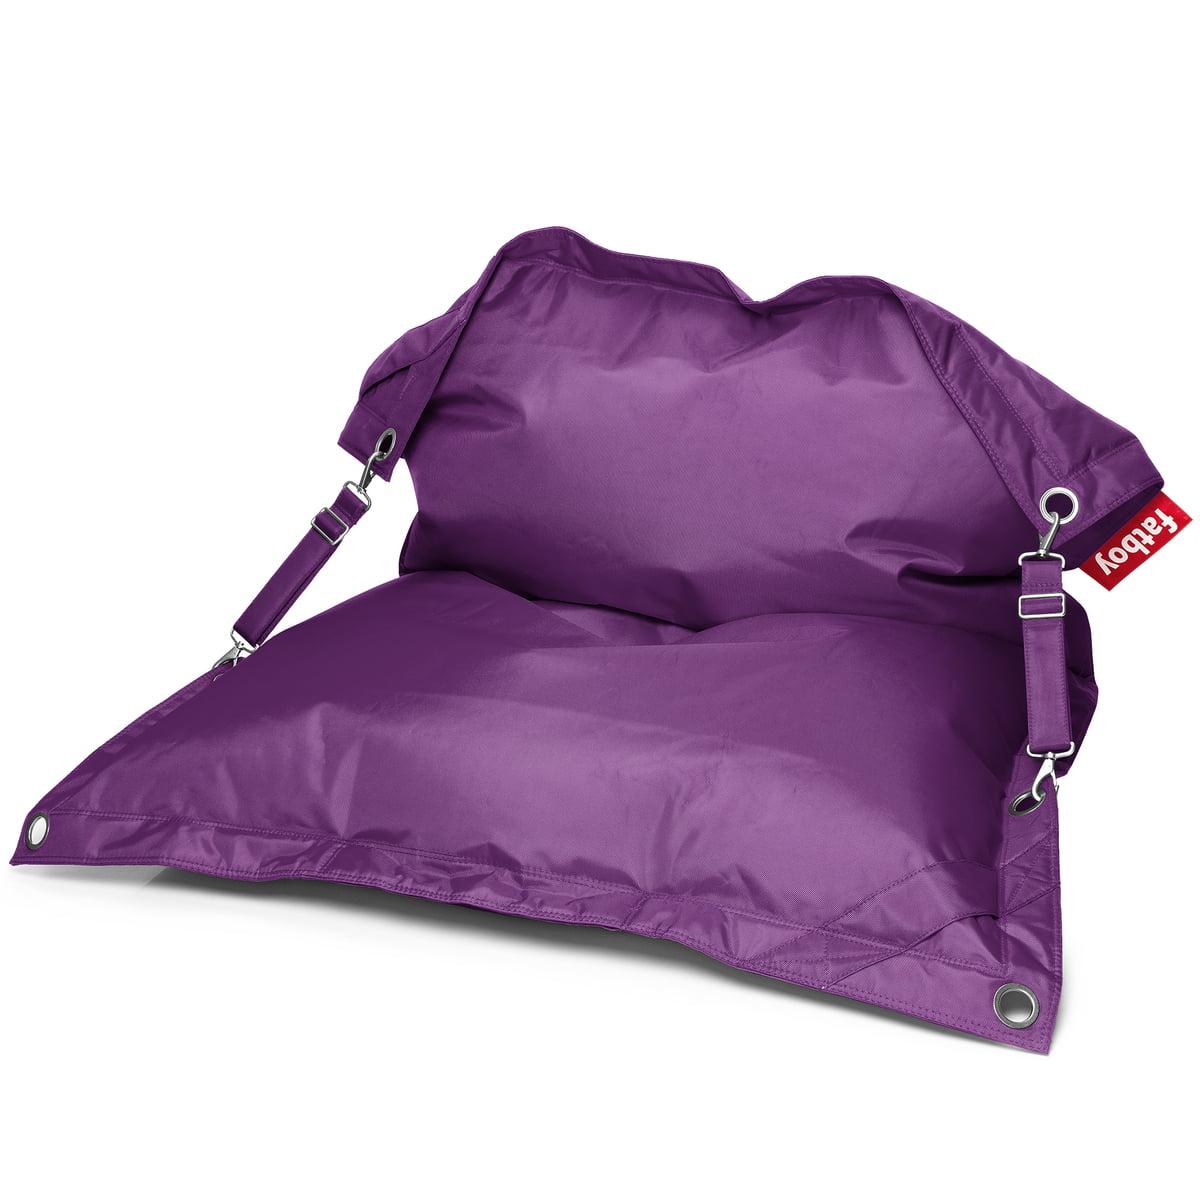 Fatboy - Buggle-up Outdoor-Sitzsack, violett | Garten > Gartenmöbel > Outdoor-Sitzsäcke | Violett | Fatboy